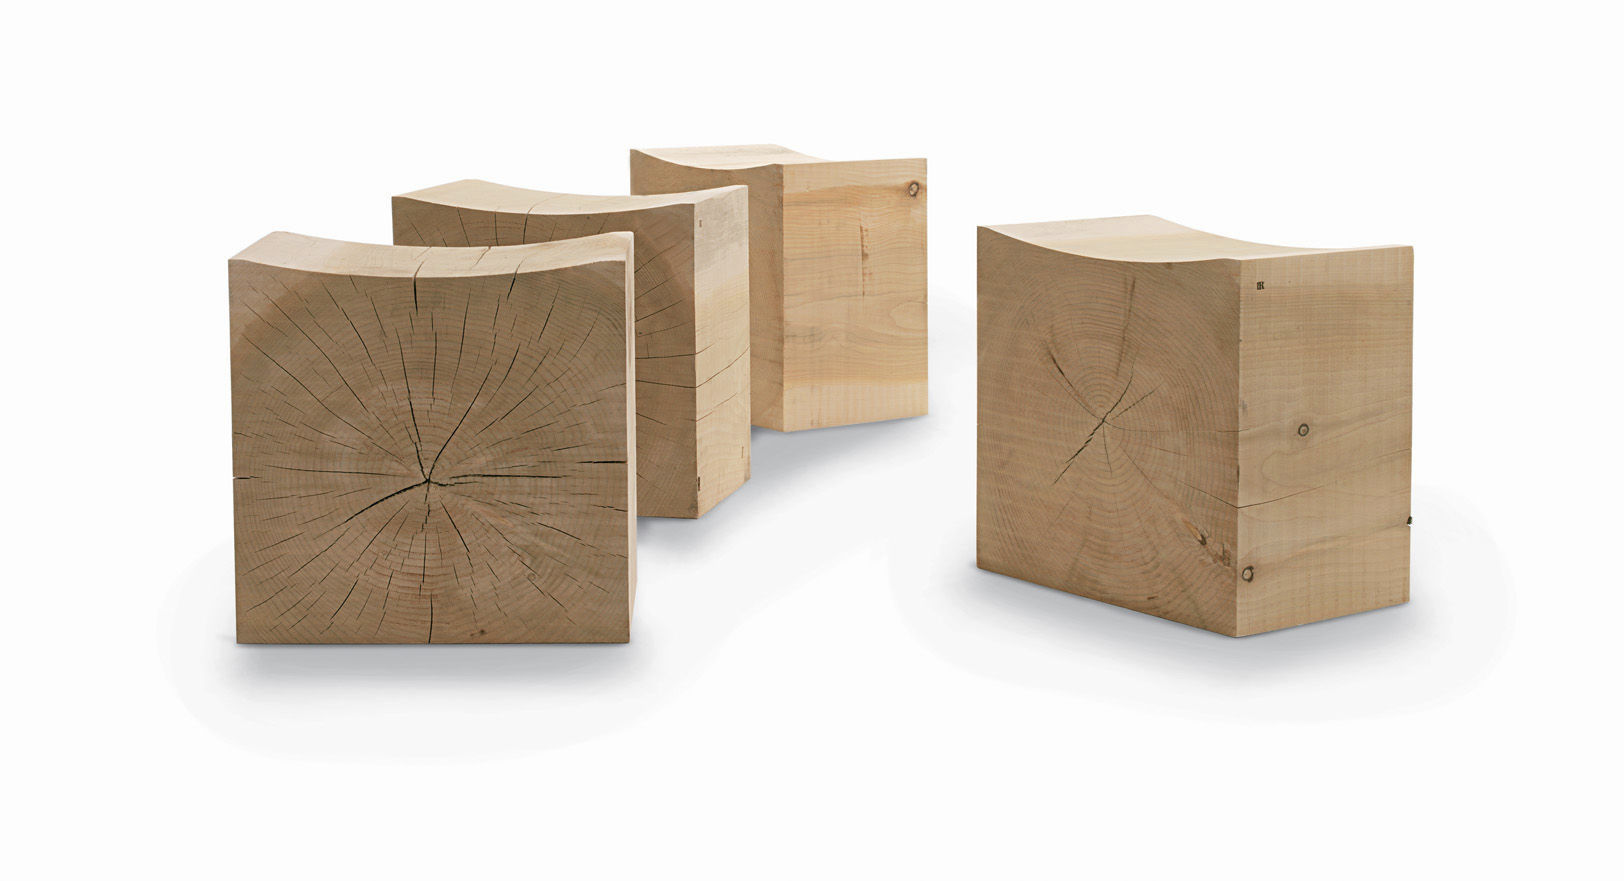 ... Contemporary stool / solid wood / cedar / garden NAPA u0026 NAPA BIG by Terry Dwan ...  sc 1 st  ArchiExpo & Contemporary stool / solid wood / cedar / garden - NAPA u0026 NAPA BIG ... islam-shia.org